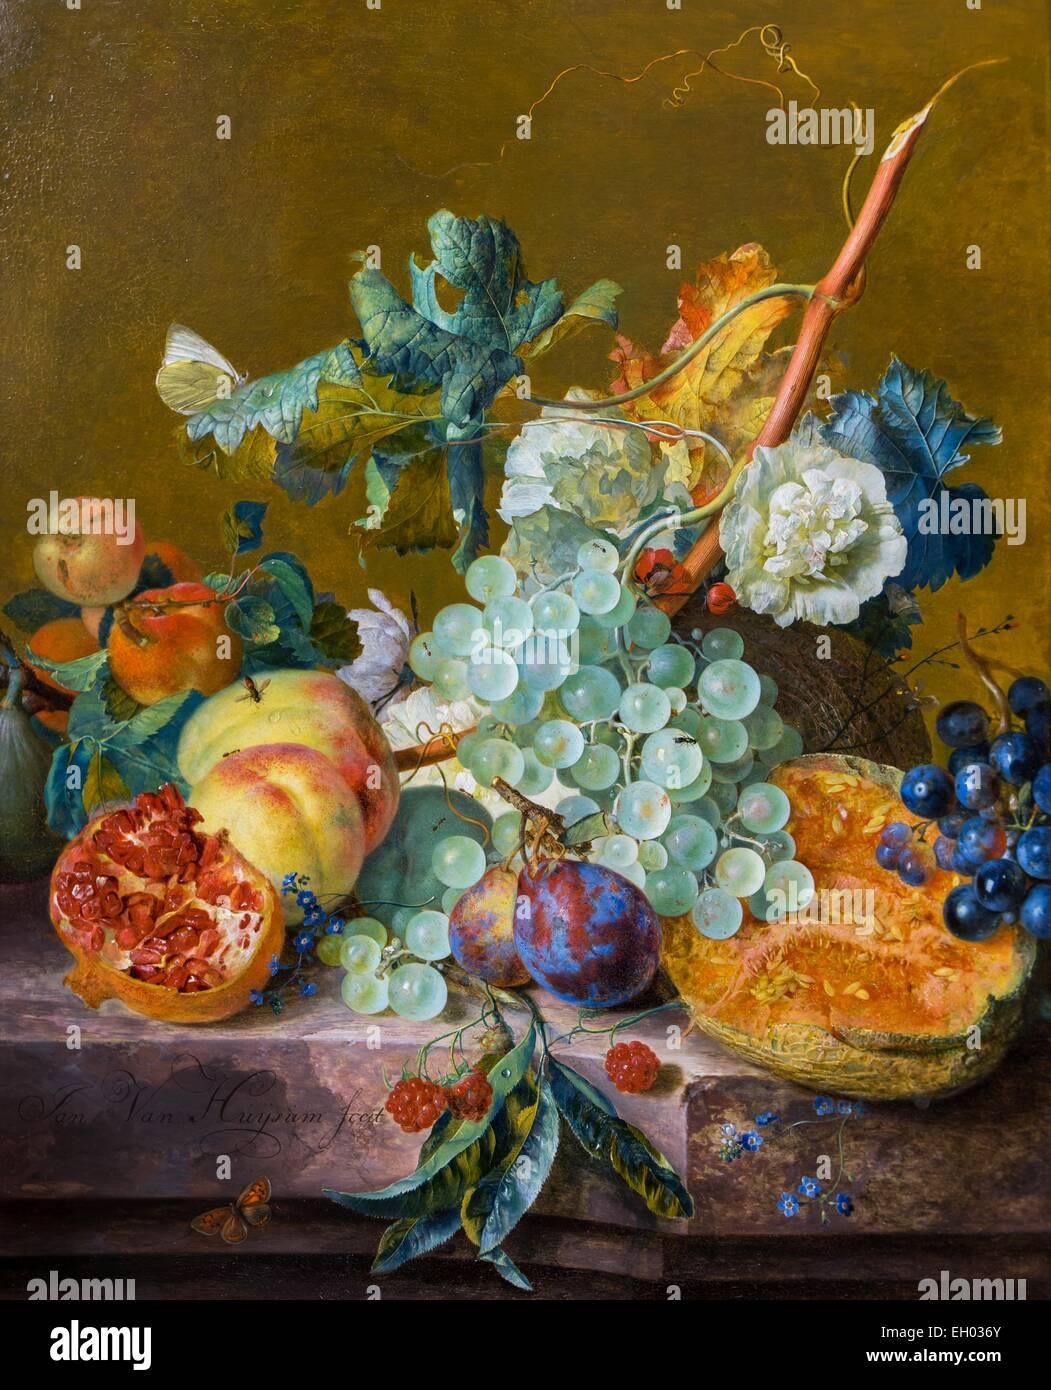 ActiveMuseum_0003302.jpg / Still Life aux fruits 25/10/2013 - 18e siècle / Collection / Musée actif Photo Stock